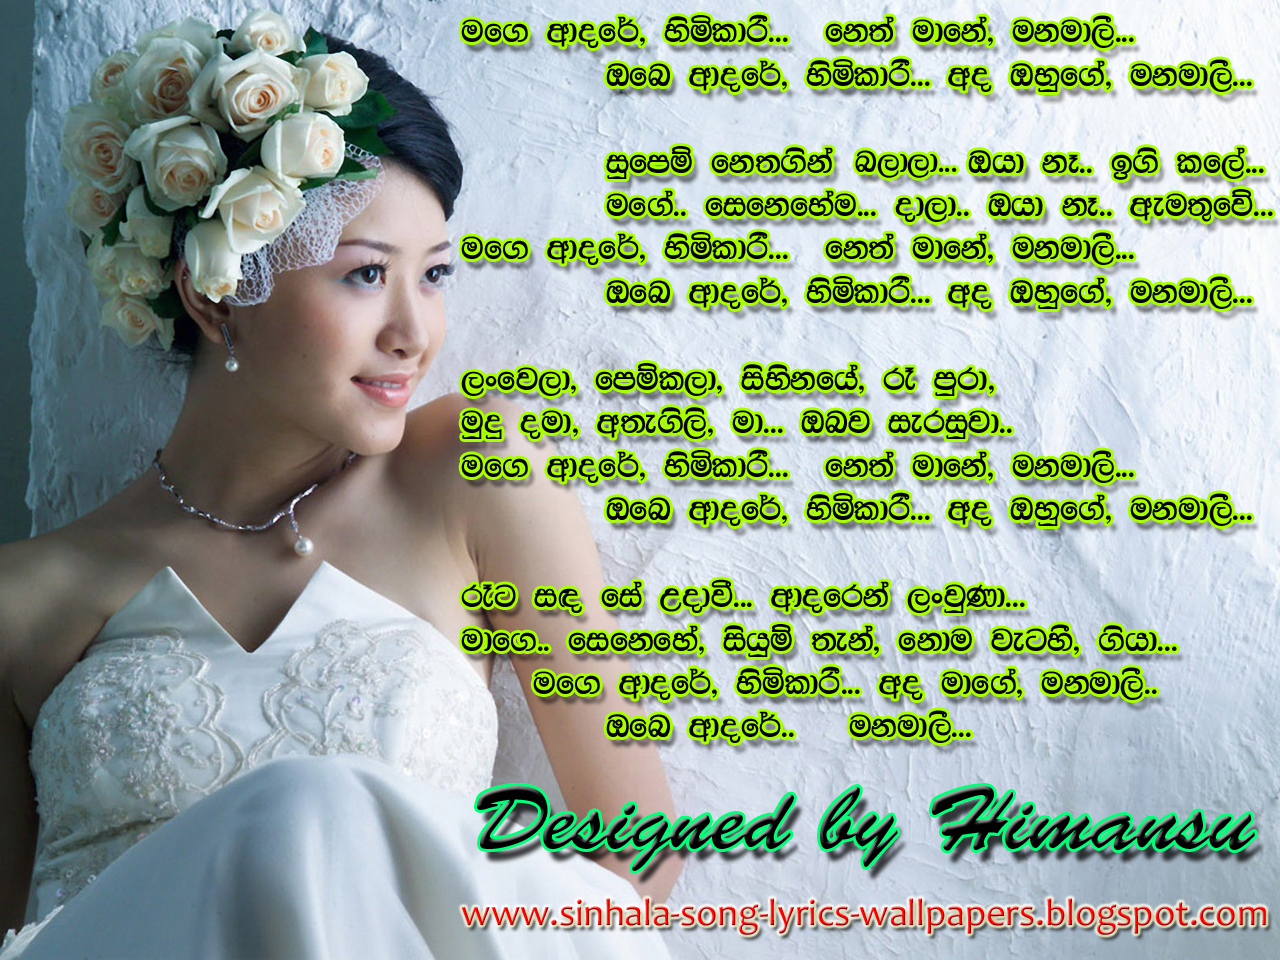 Love Wallpapers Sinhala : New Love Photos Sinhala - impremedia.net